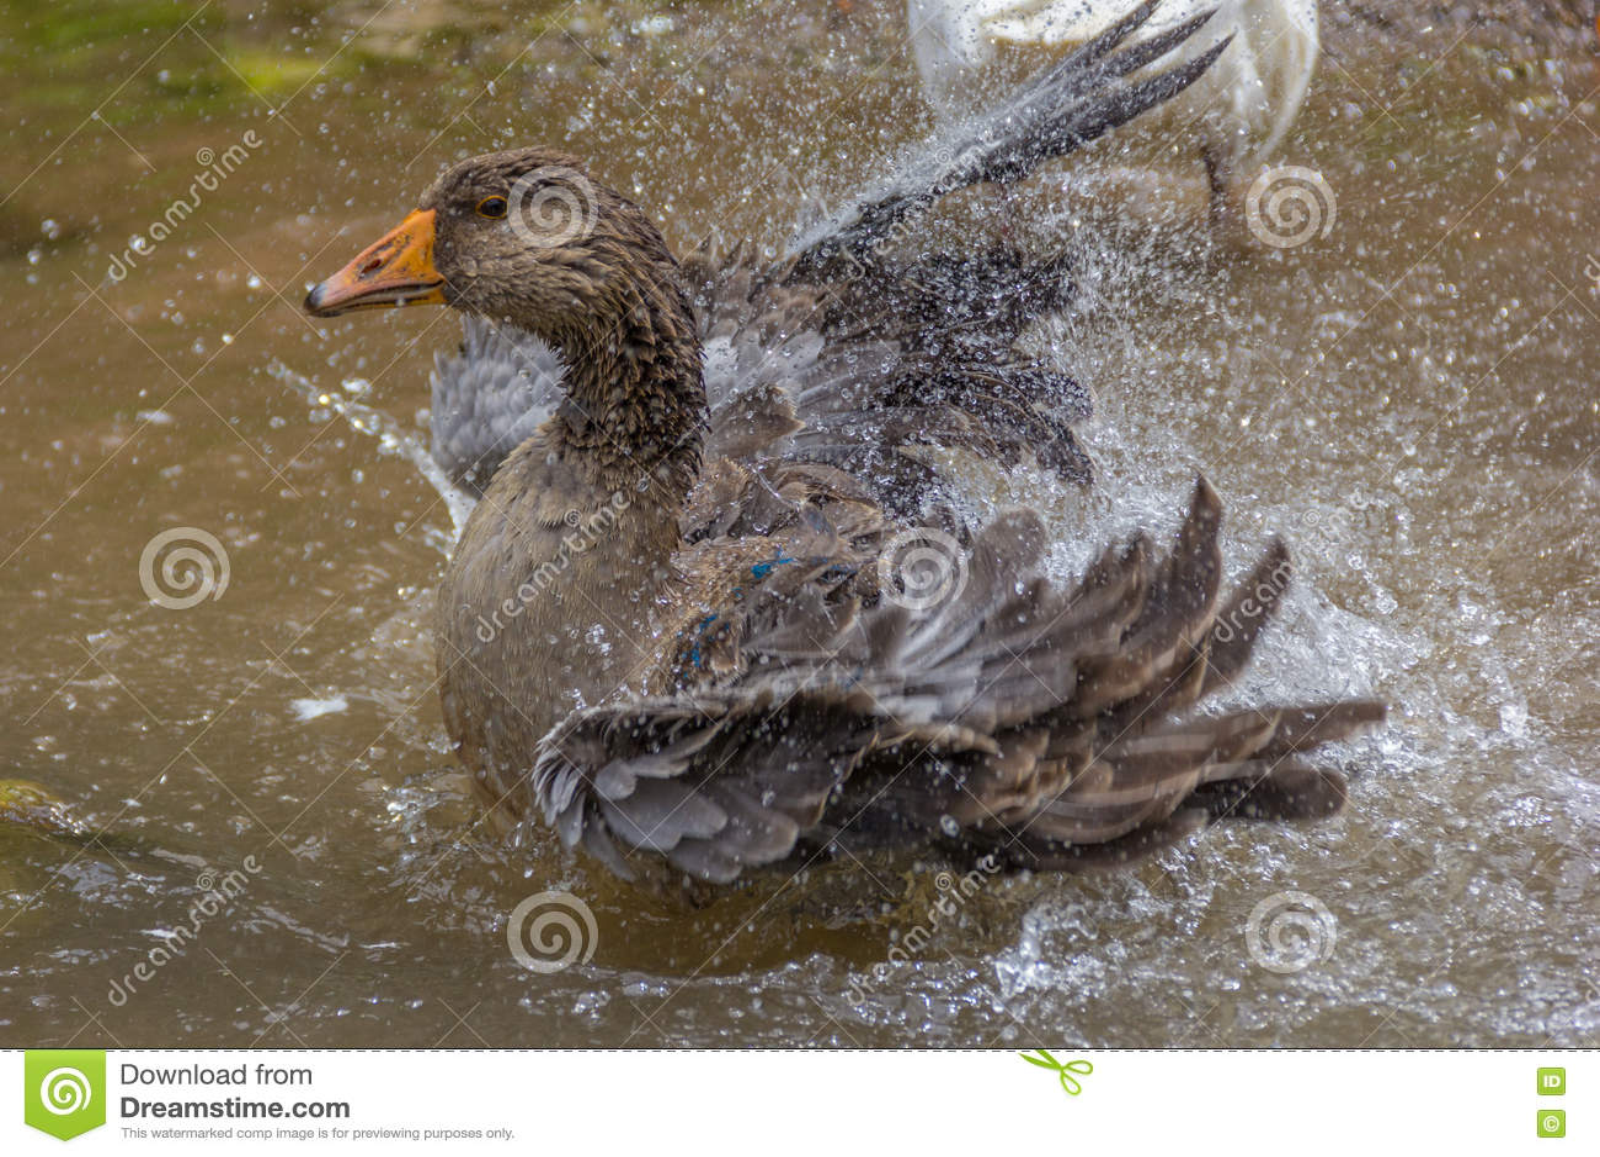 Greylag goose preening and splashing in the water